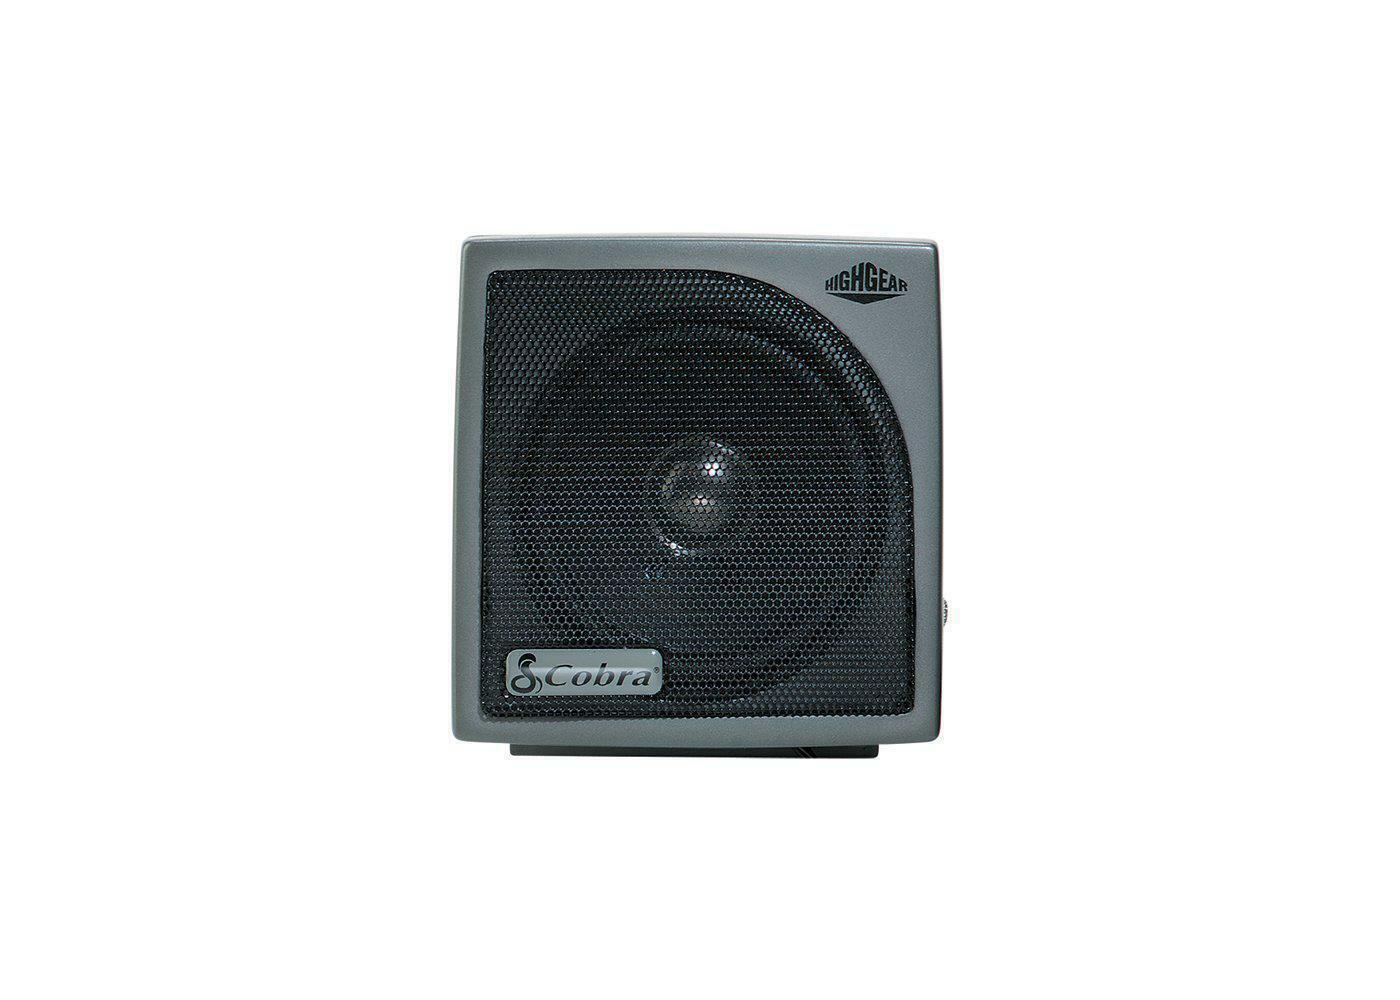 cobraelectronics Cobra HG S500 - Dynamic External CB Speaker with Noise Filter and Talk-back